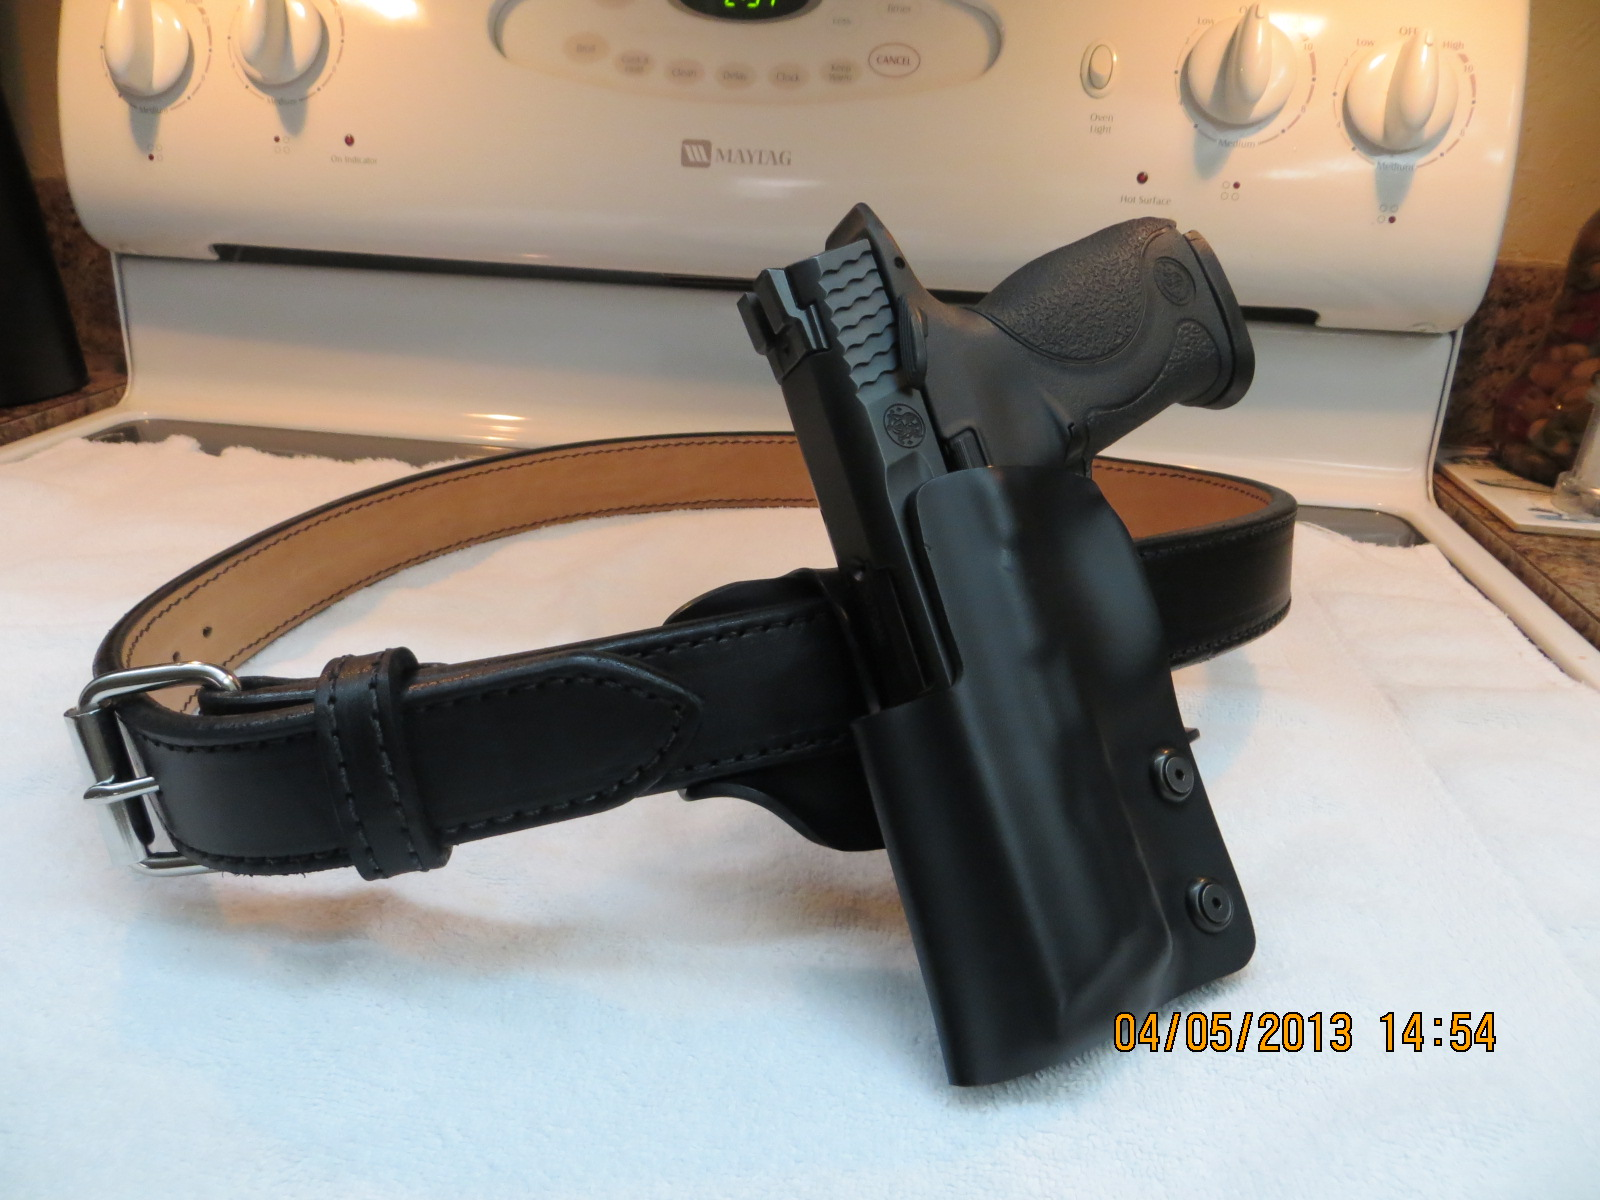 Leather gun belts vs kydex reinforced leather gun belts-img_0007-001.jpg